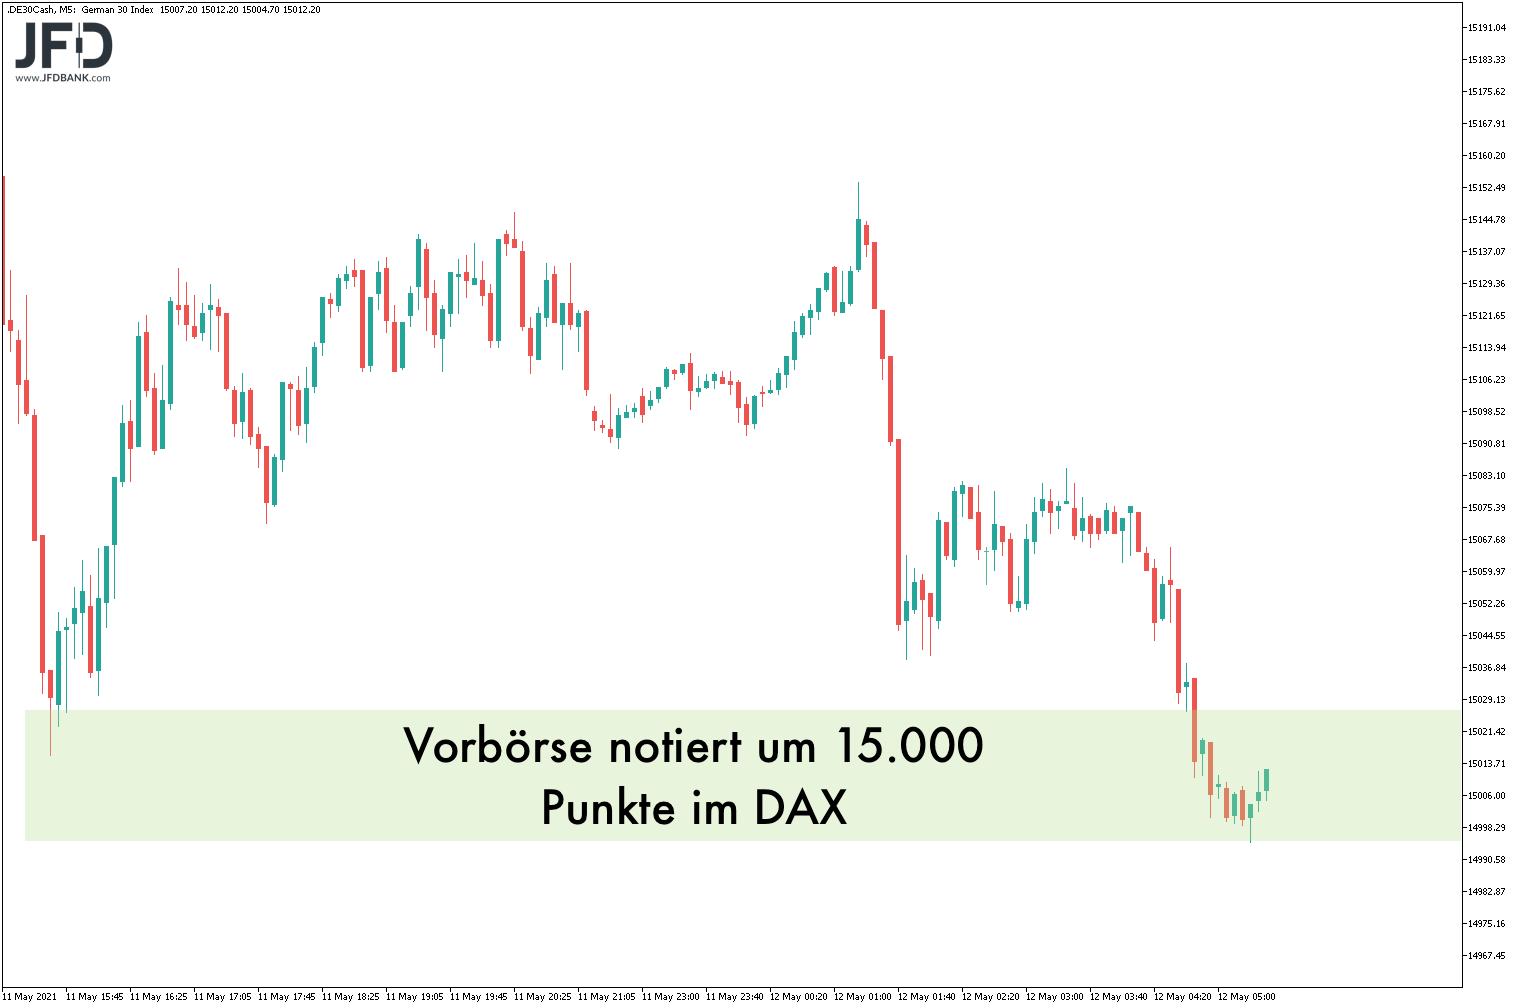 Kampf-um-die-15-000-wieder-eröffnet-Kommentar-JFD-Bank-GodmodeTrader.de-7